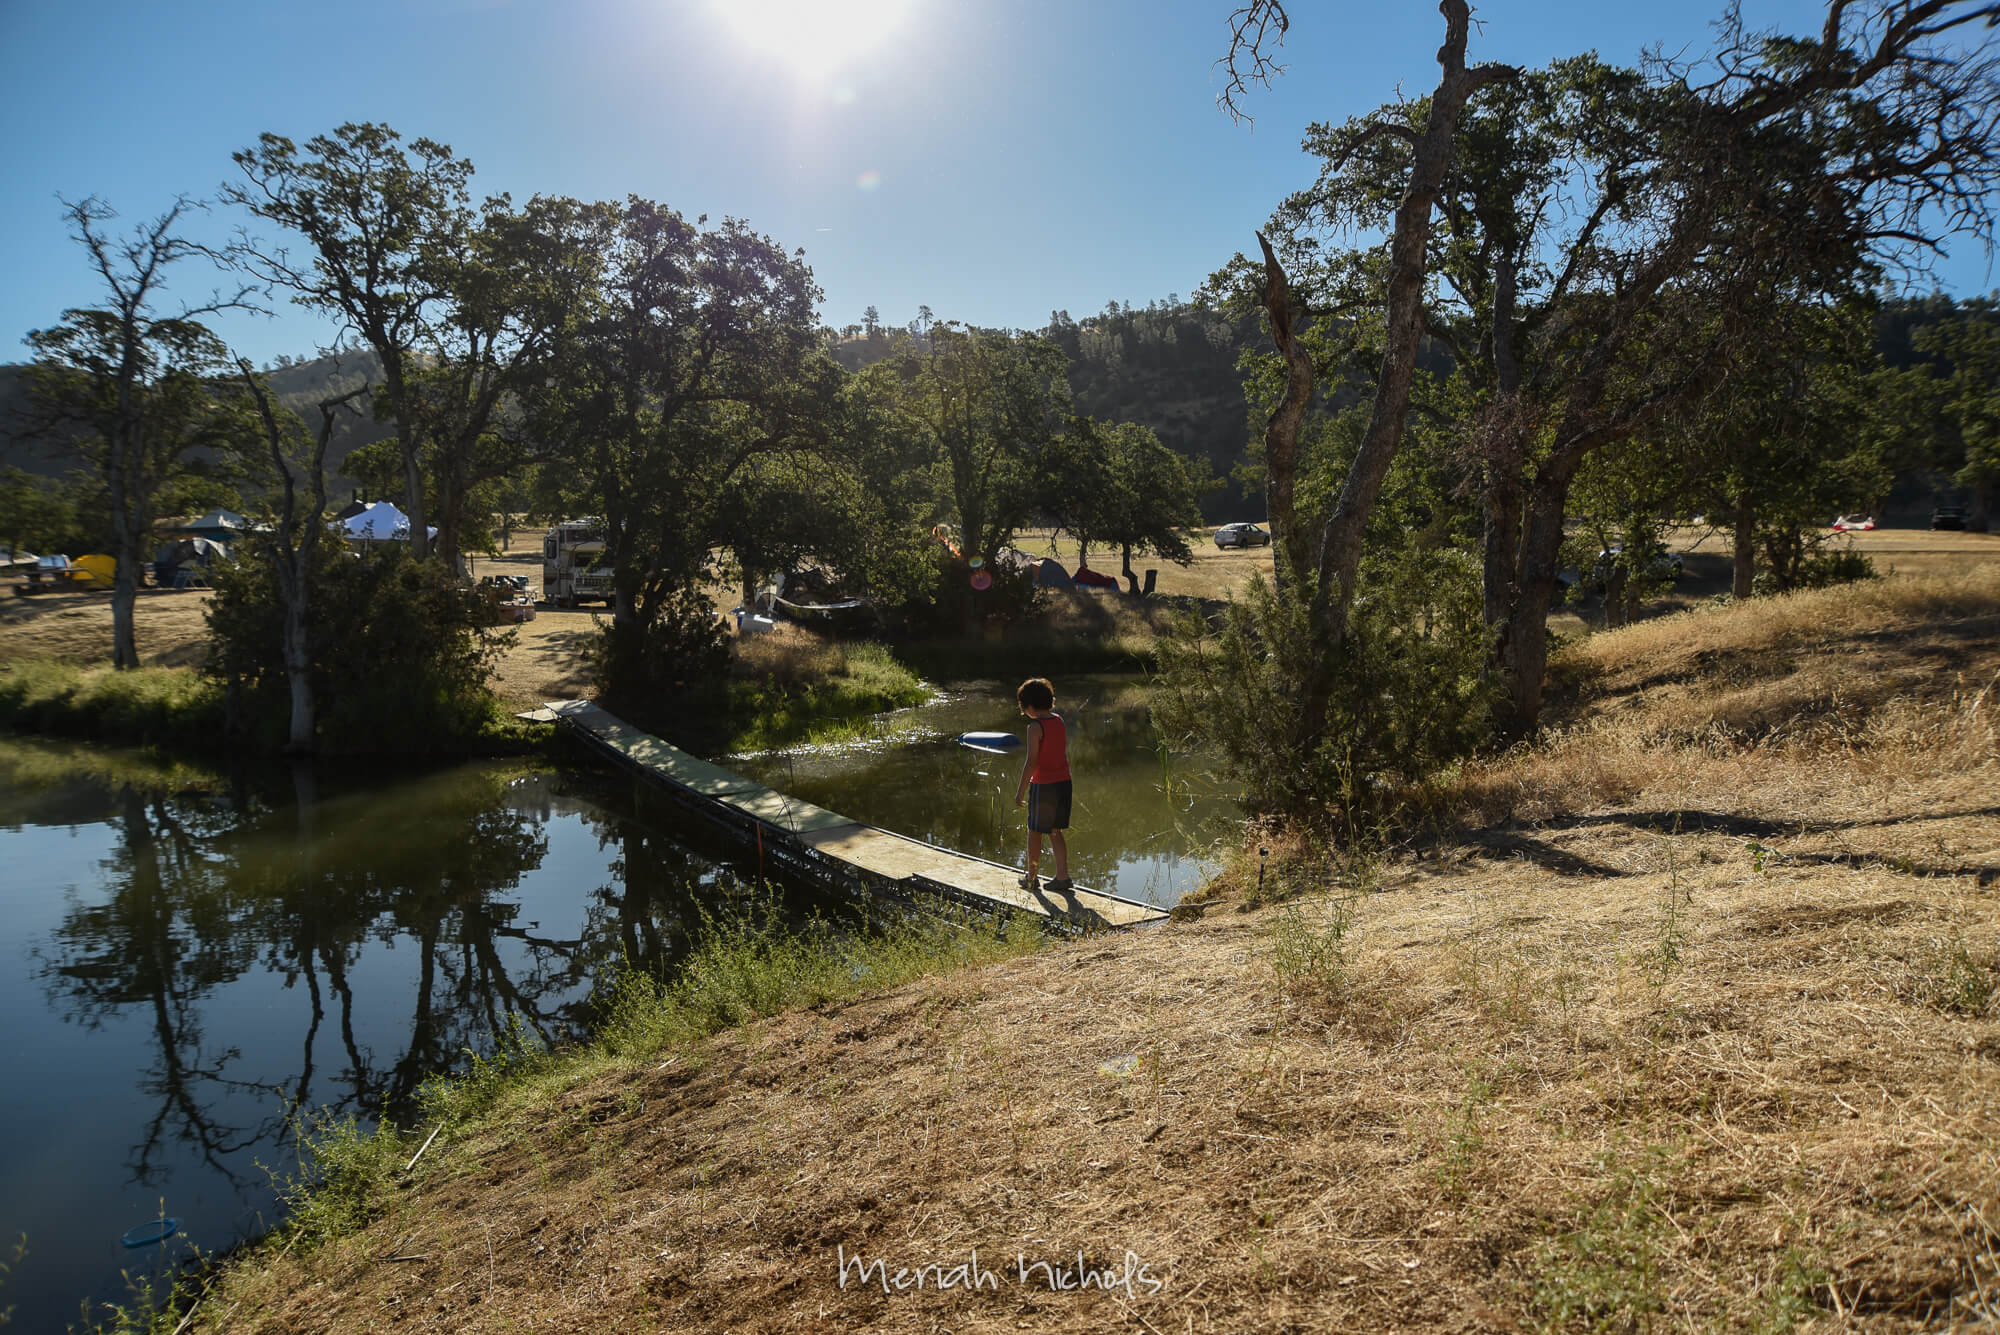 Meriah Nichols Camp Tipsy-66